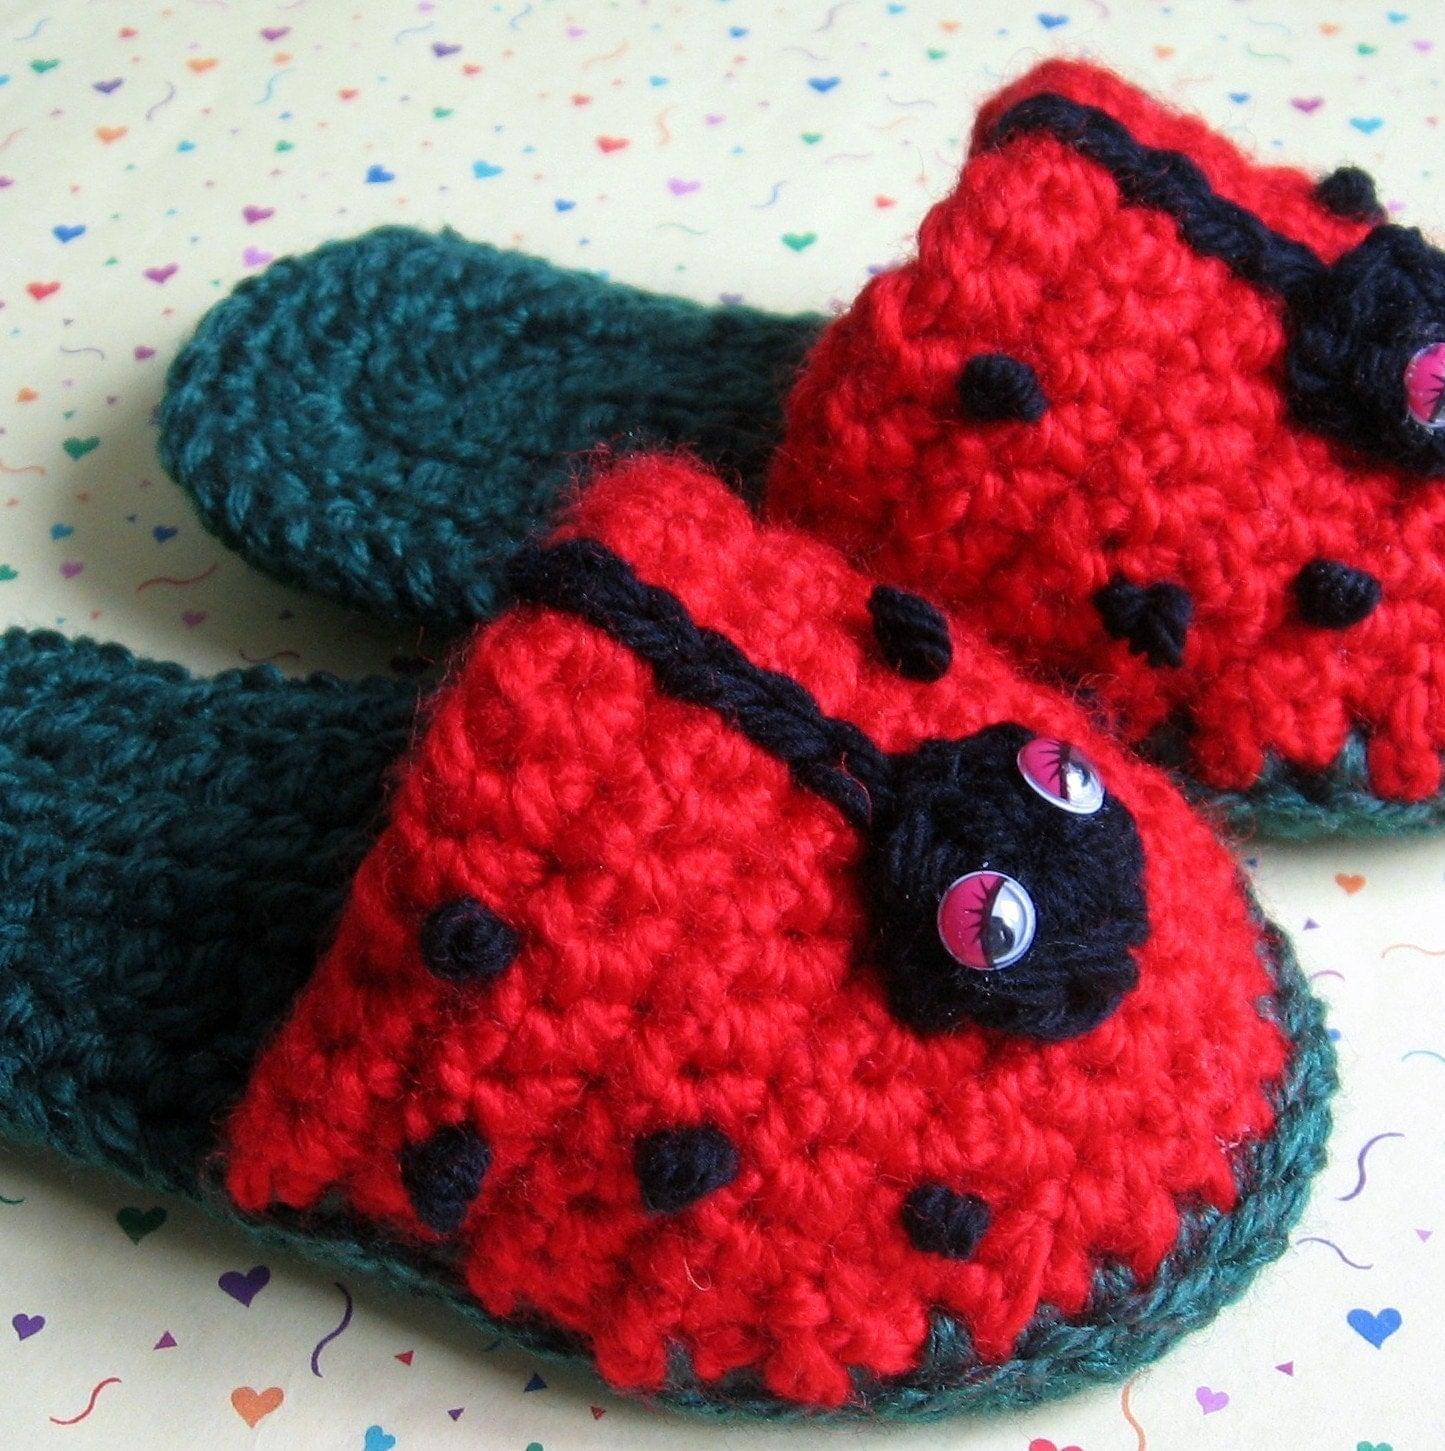 crochet pattern central free toys crochet pattern link